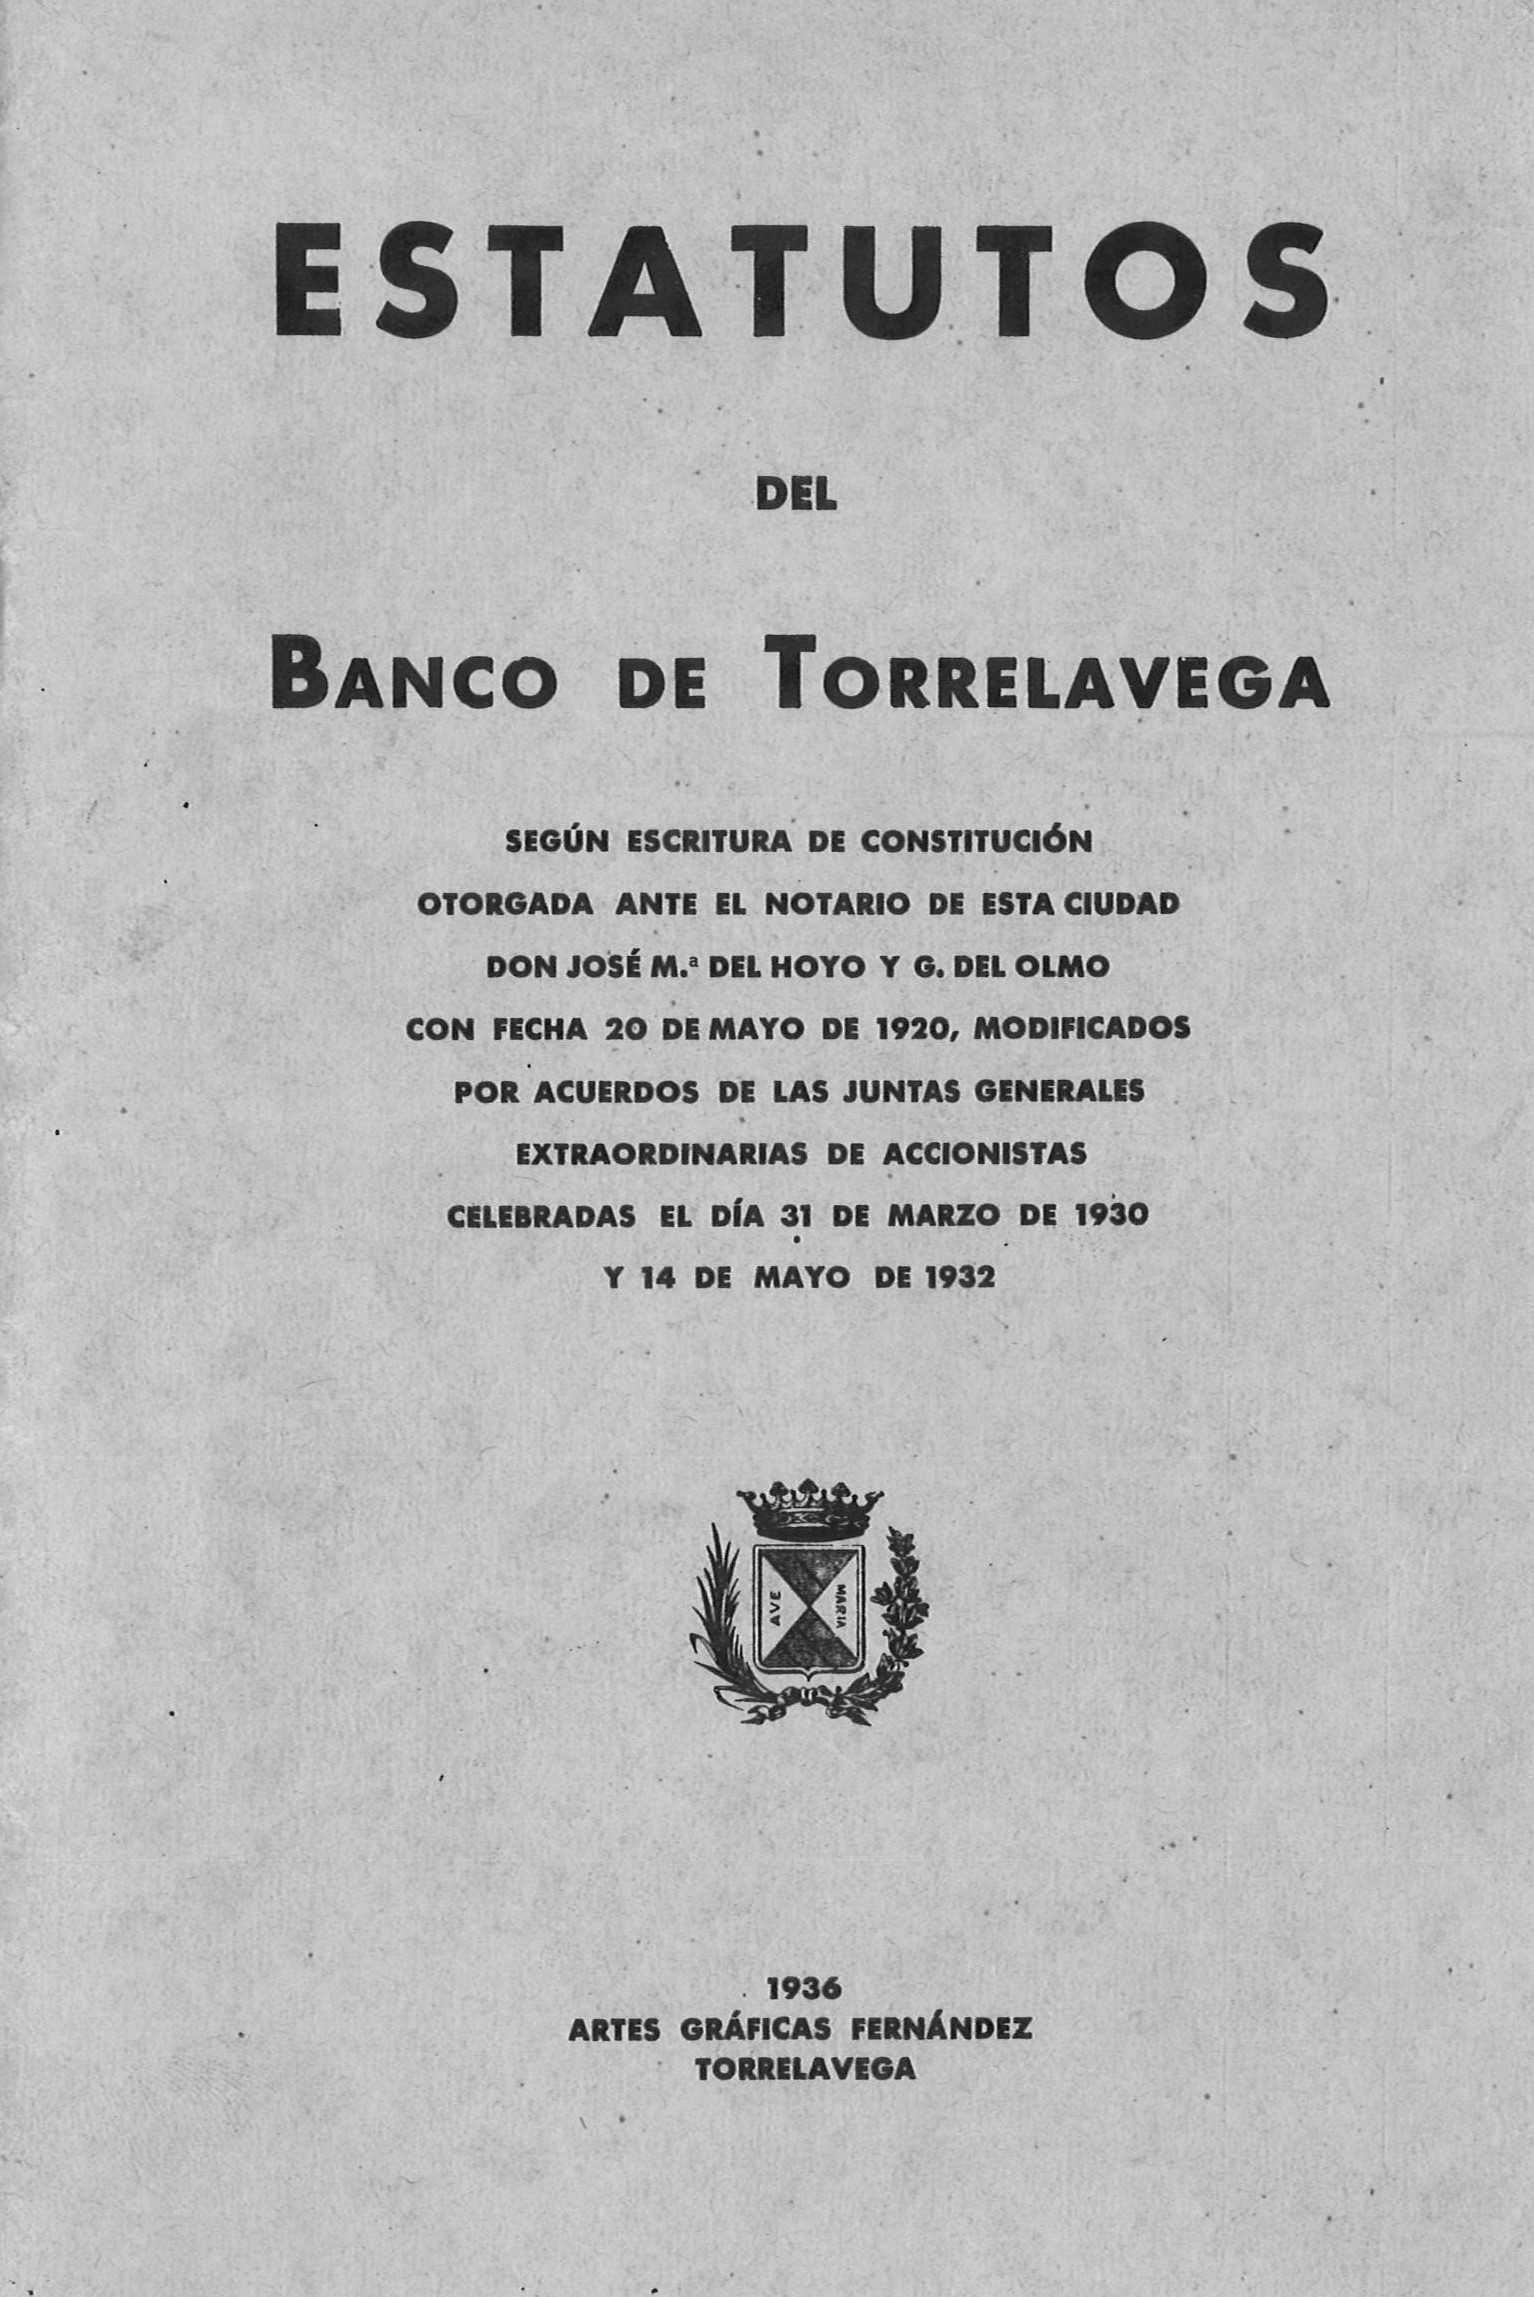 Banco de Torrelavega